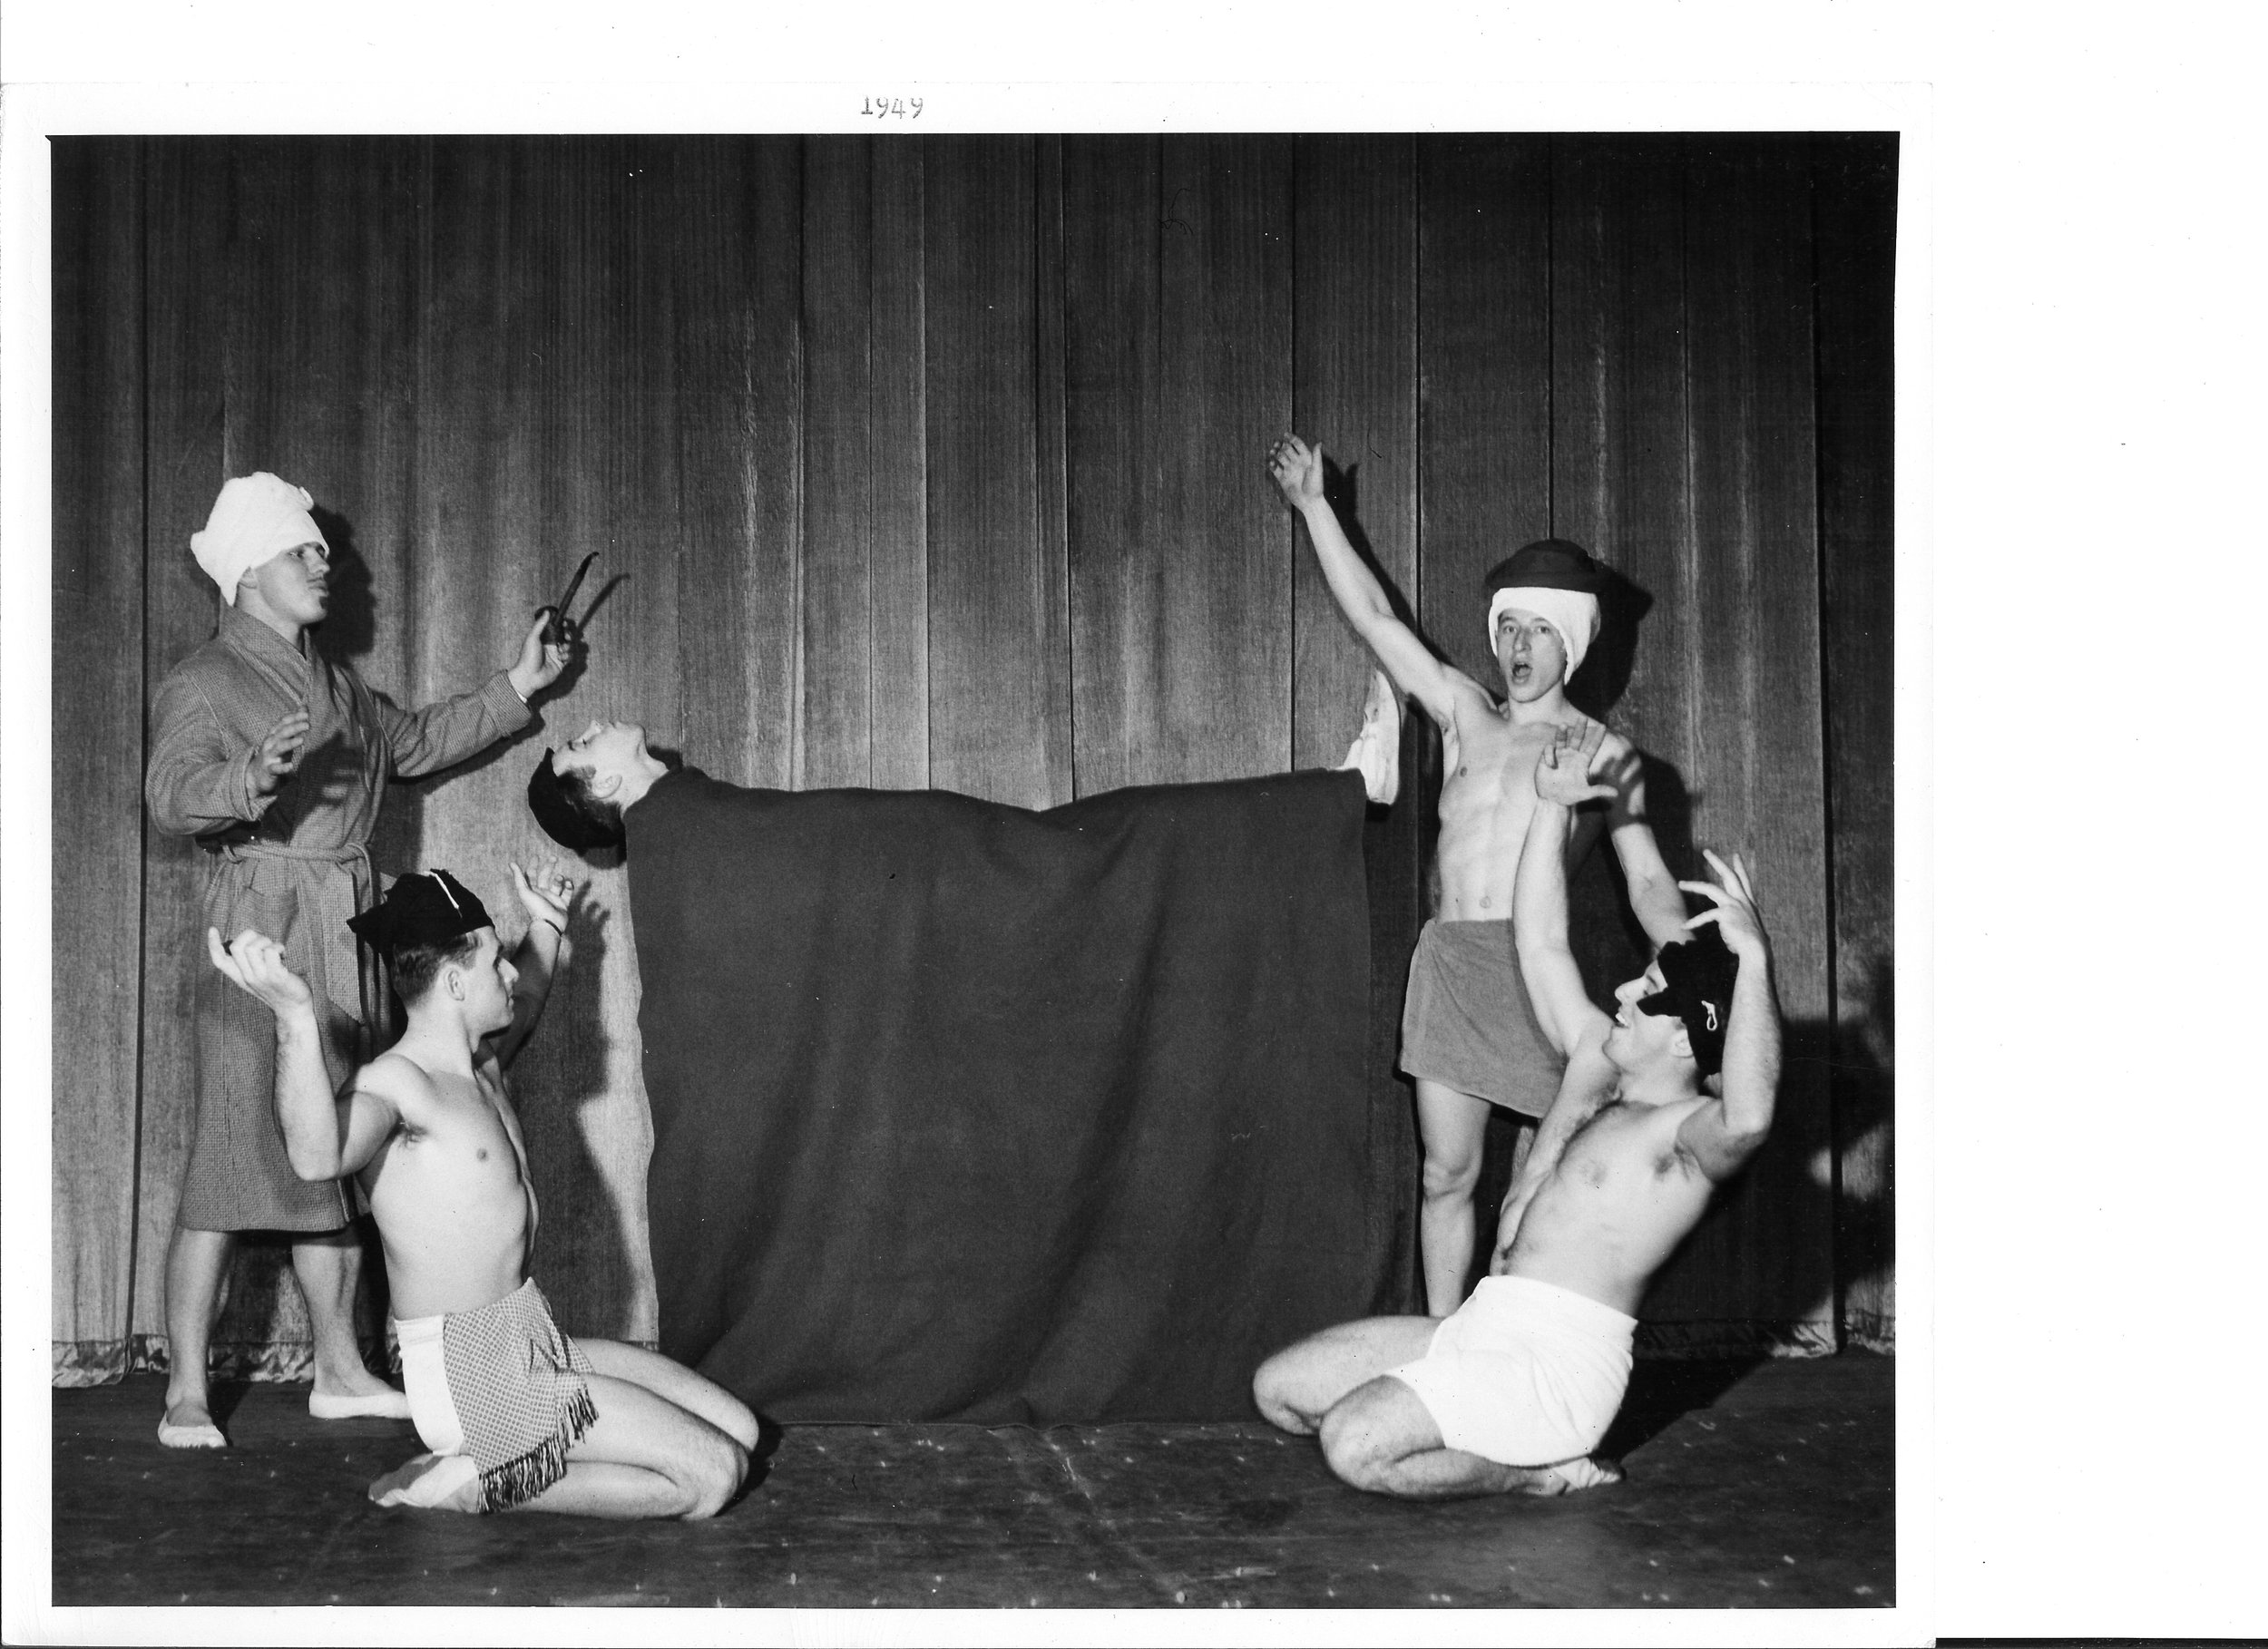 1949 Levitation Mystery - George Sorg, Chuck Finch, Bill Harris, Bill Foland, Harold Buckley.jpg